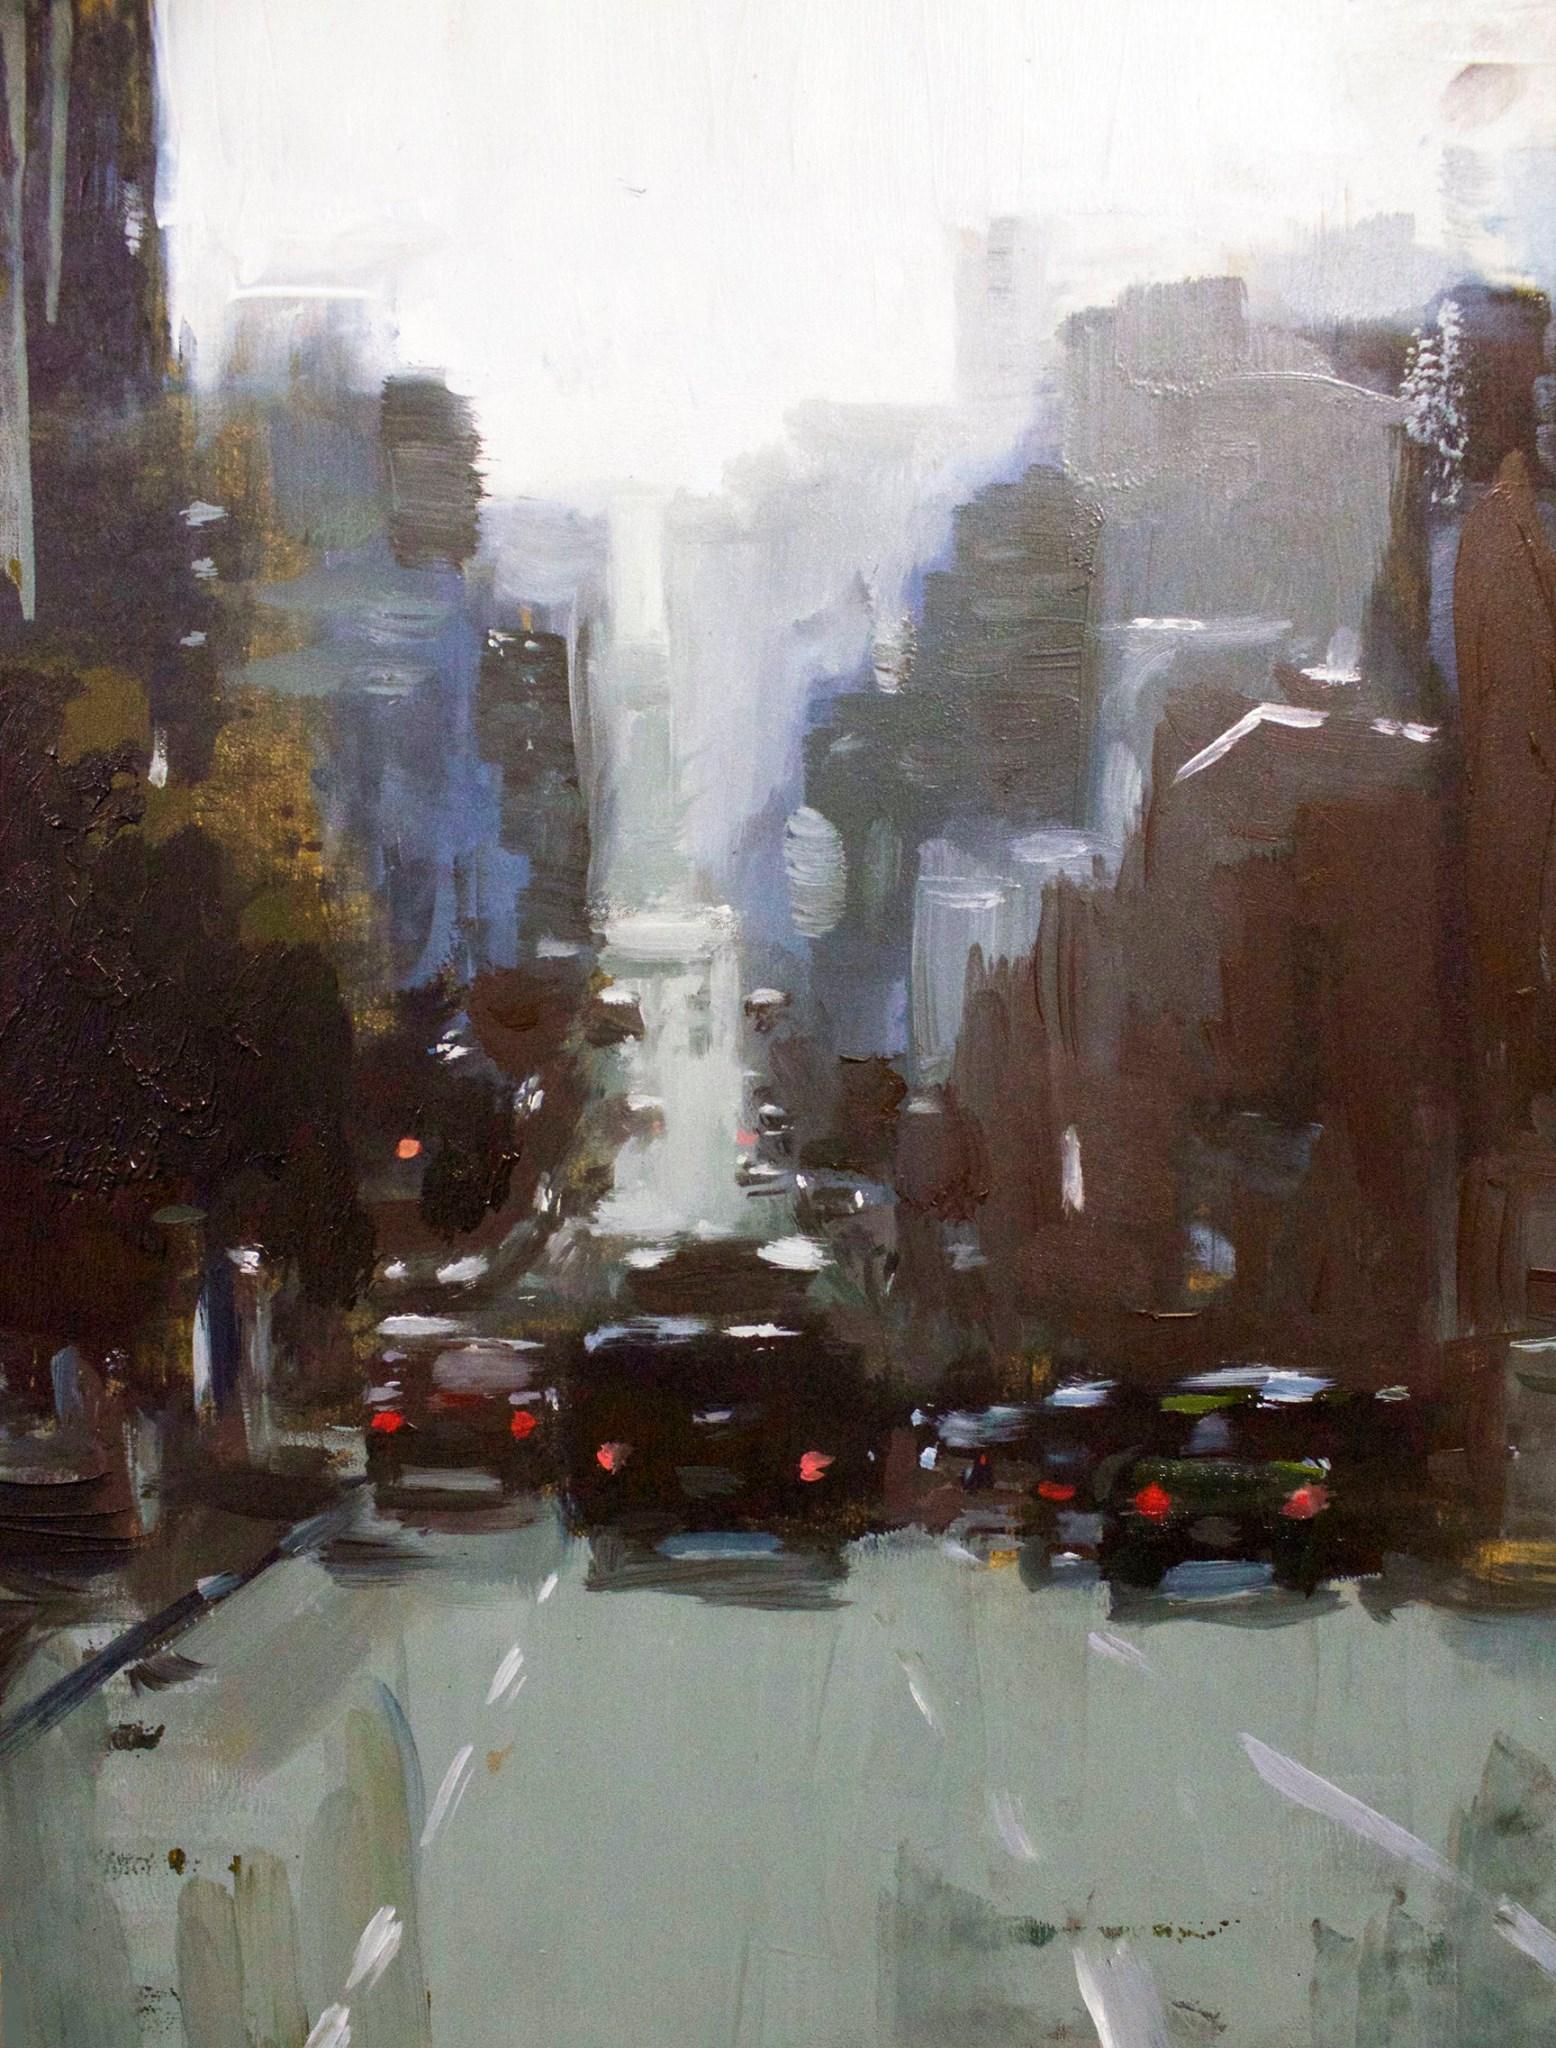 jose-alfonso-jd-alfonso-san-francisco-hill-oil-painting.jpg